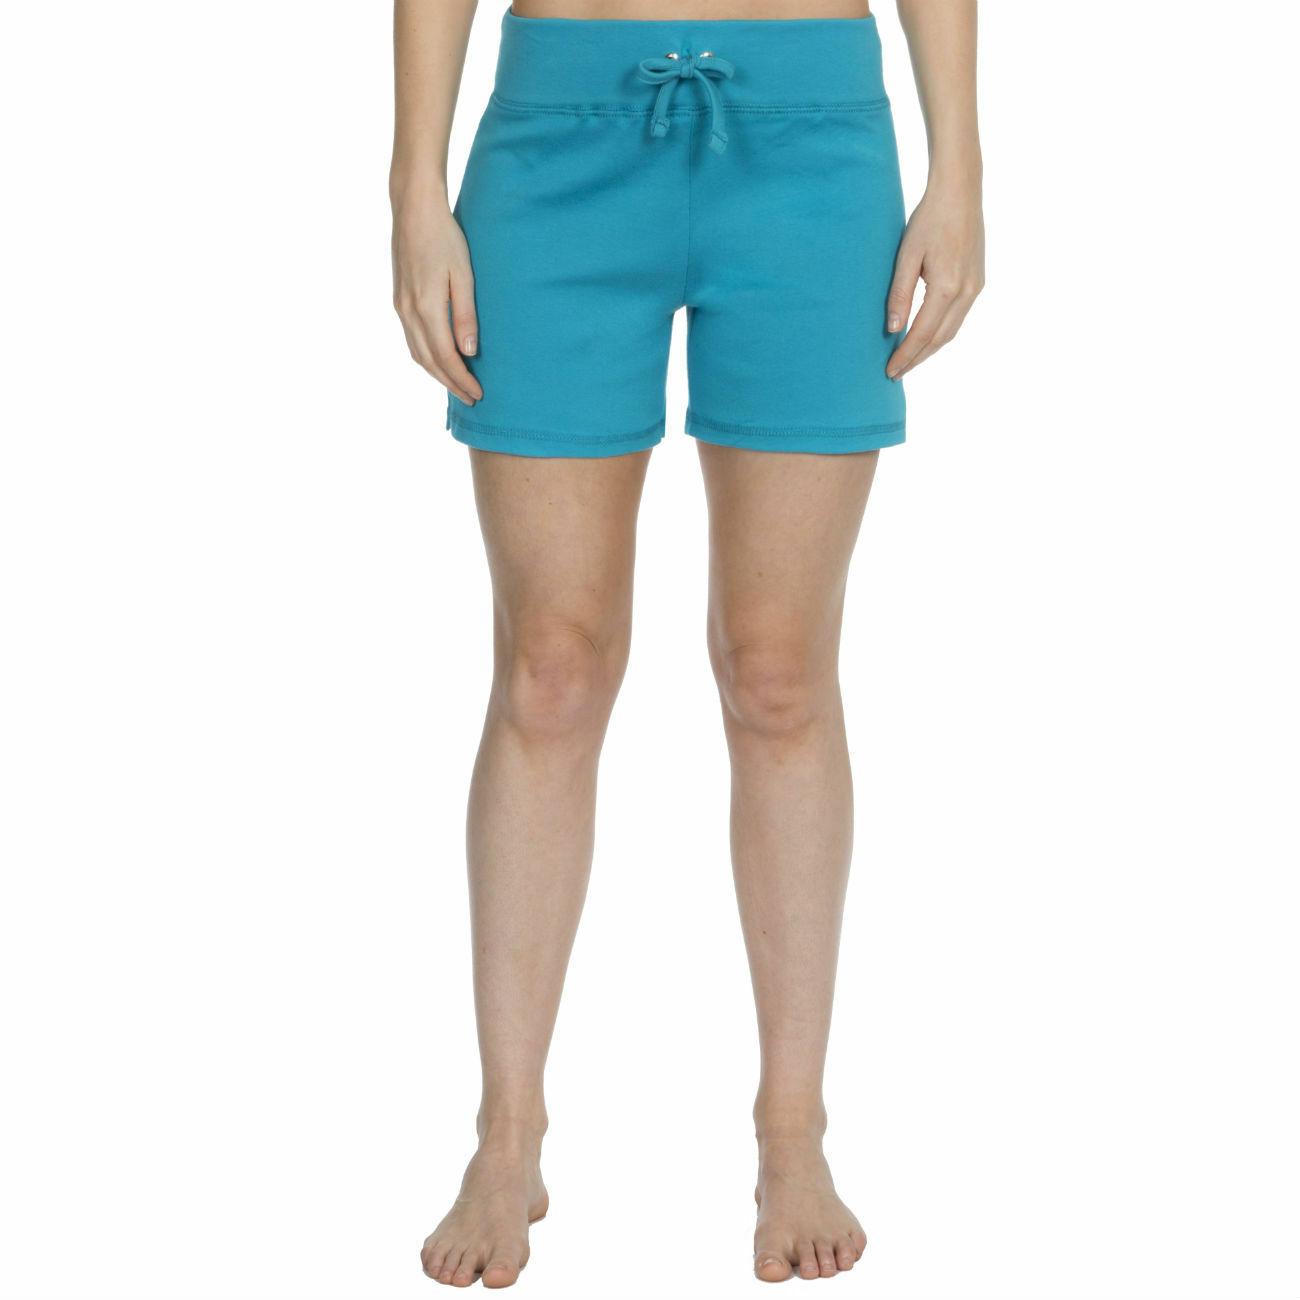 Womens-Cotton-Jersey-Shorts-Elastic-Waist-Summer-Beach-Casual-Yoga-Hot-Pants-New thumbnail 24